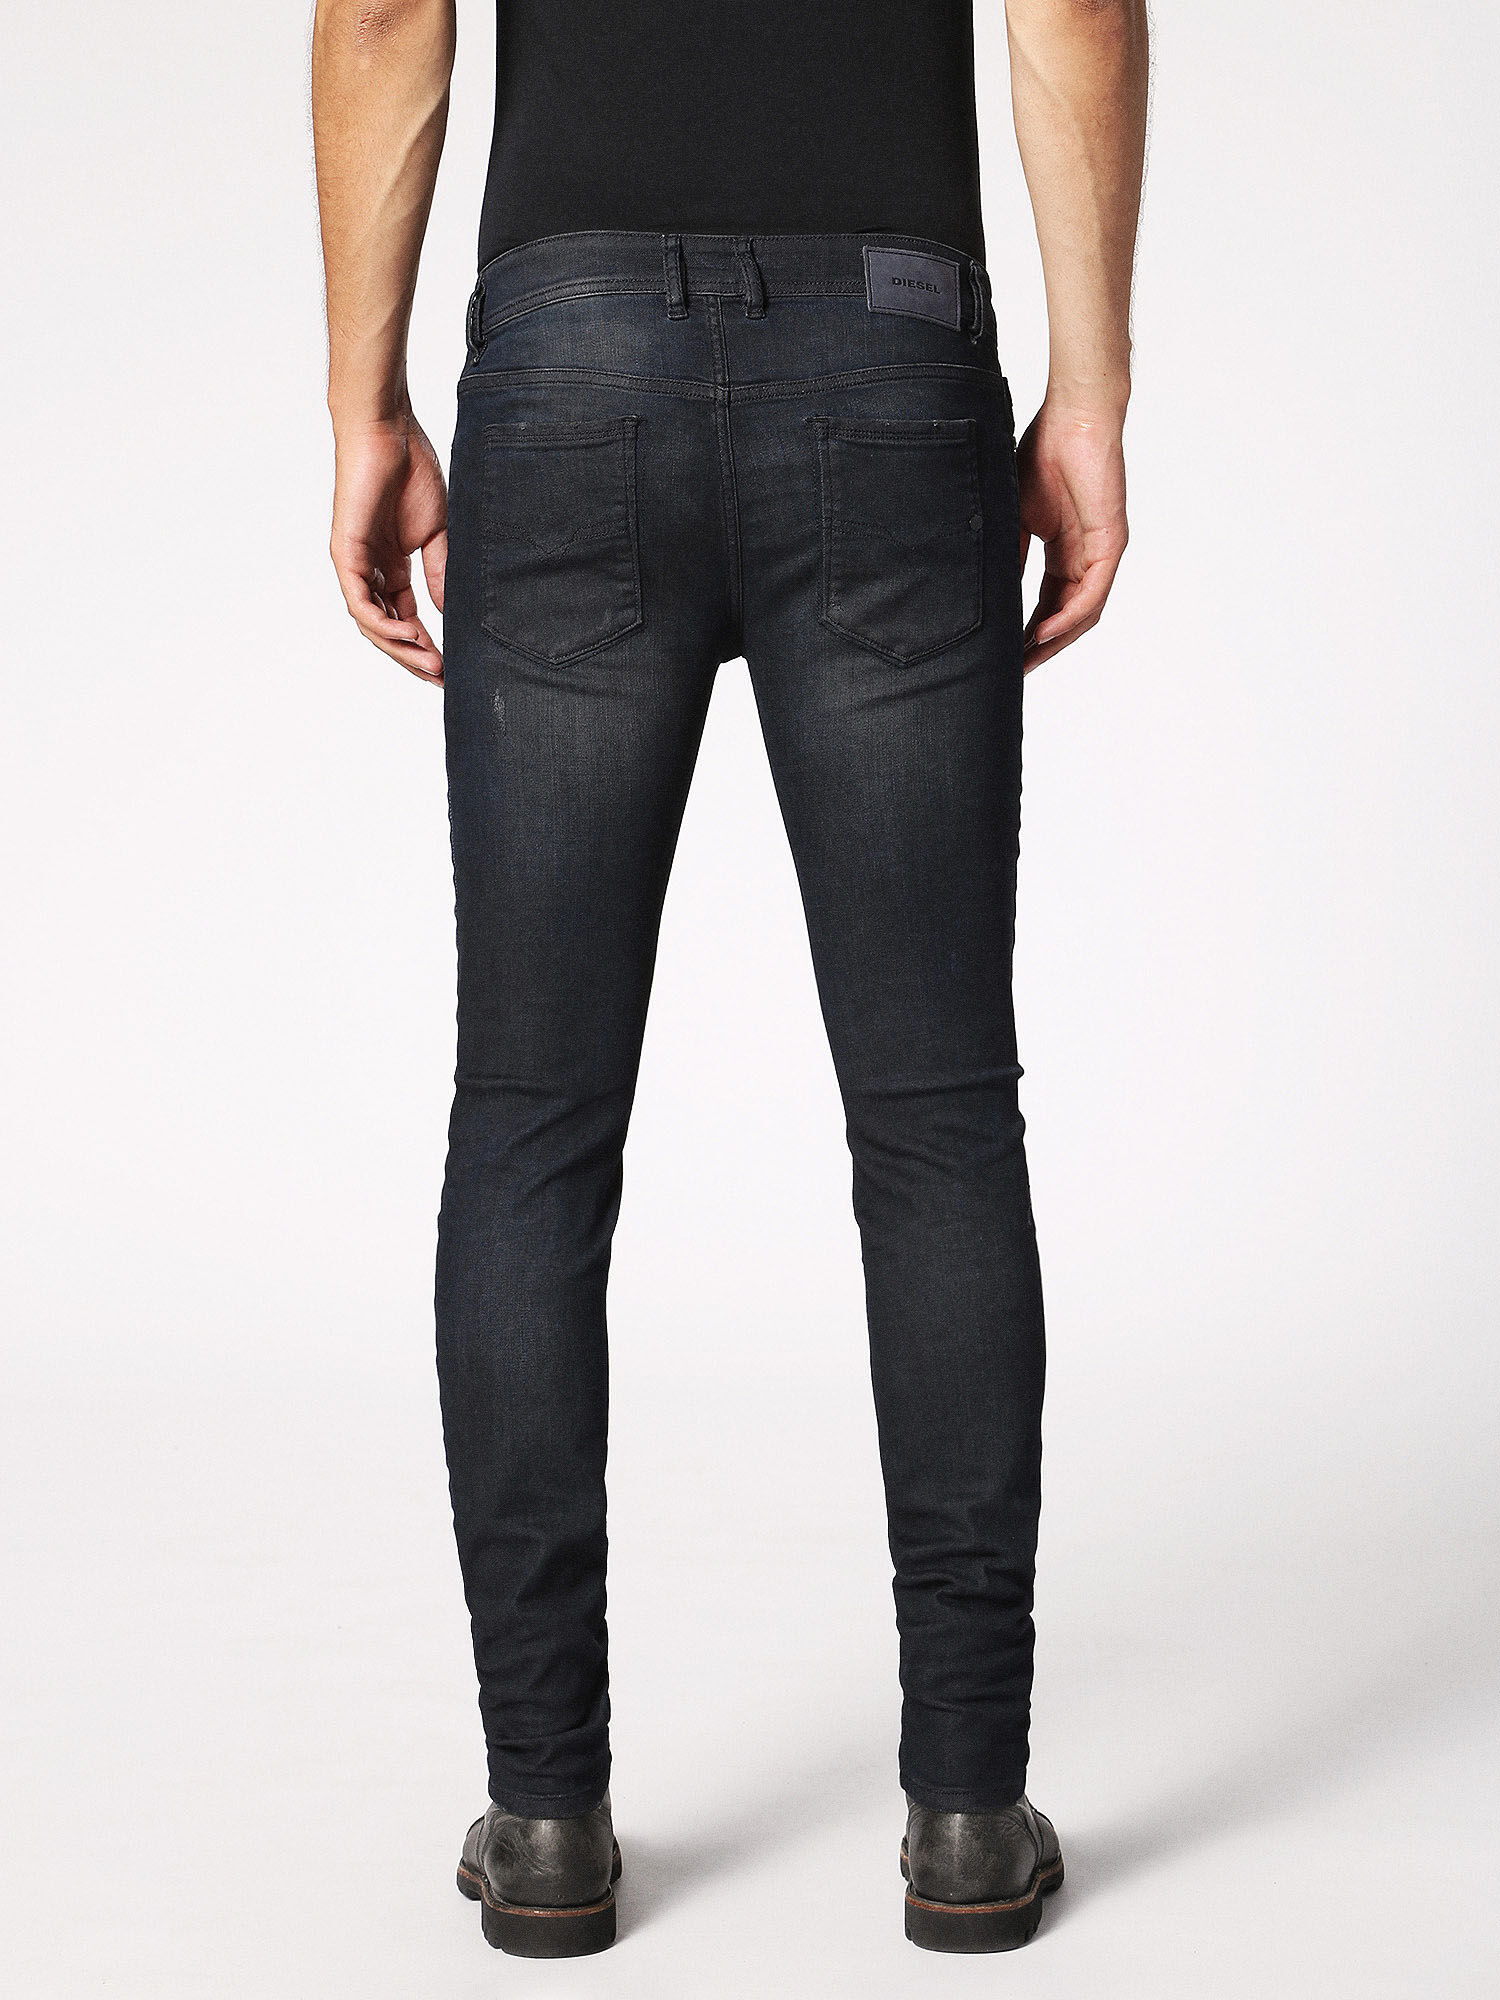 Diesel jeans sleenker schwarz